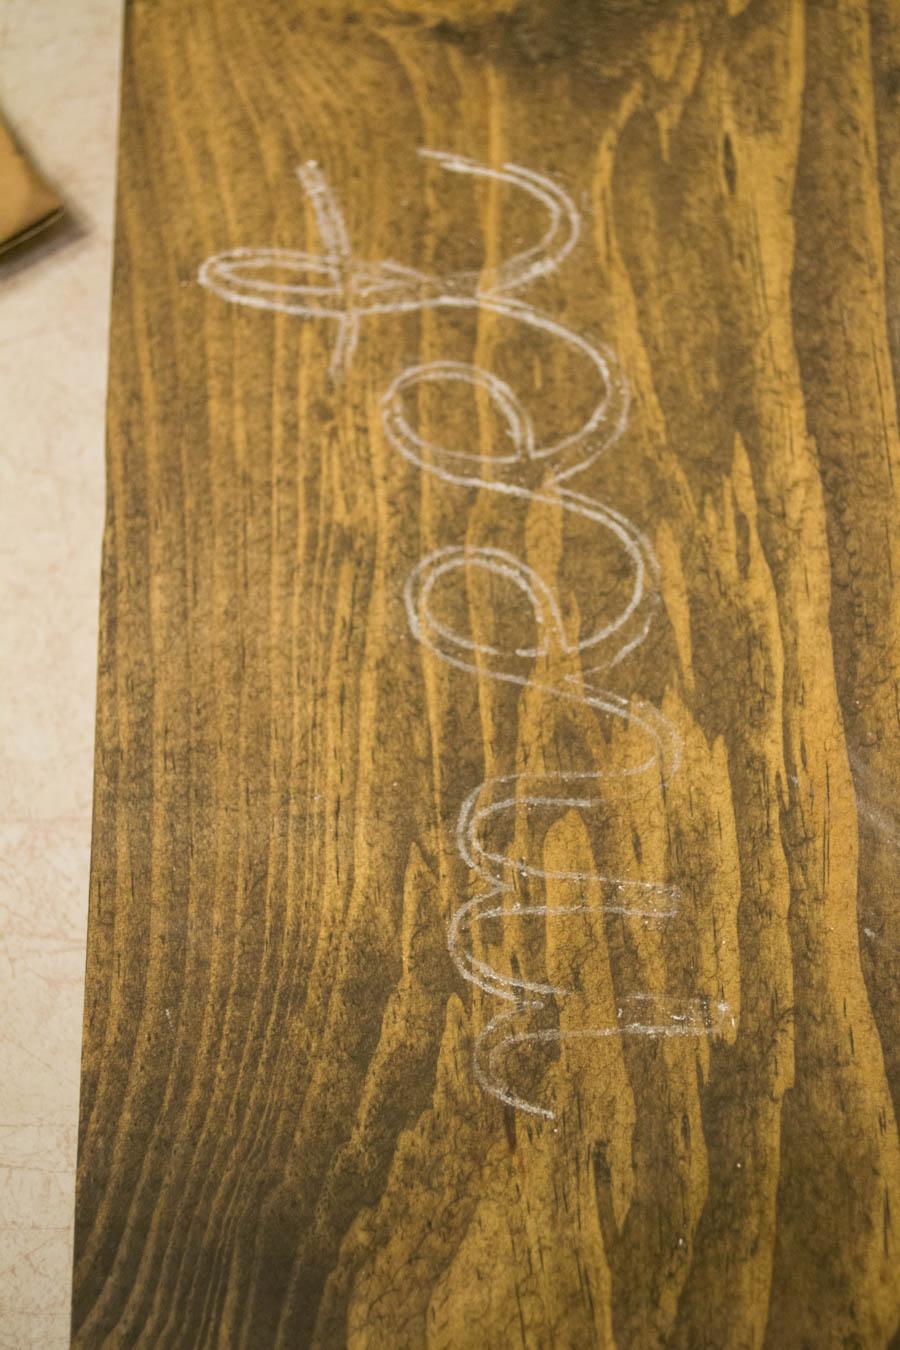 chalk-outline-on-baord-1-of-1